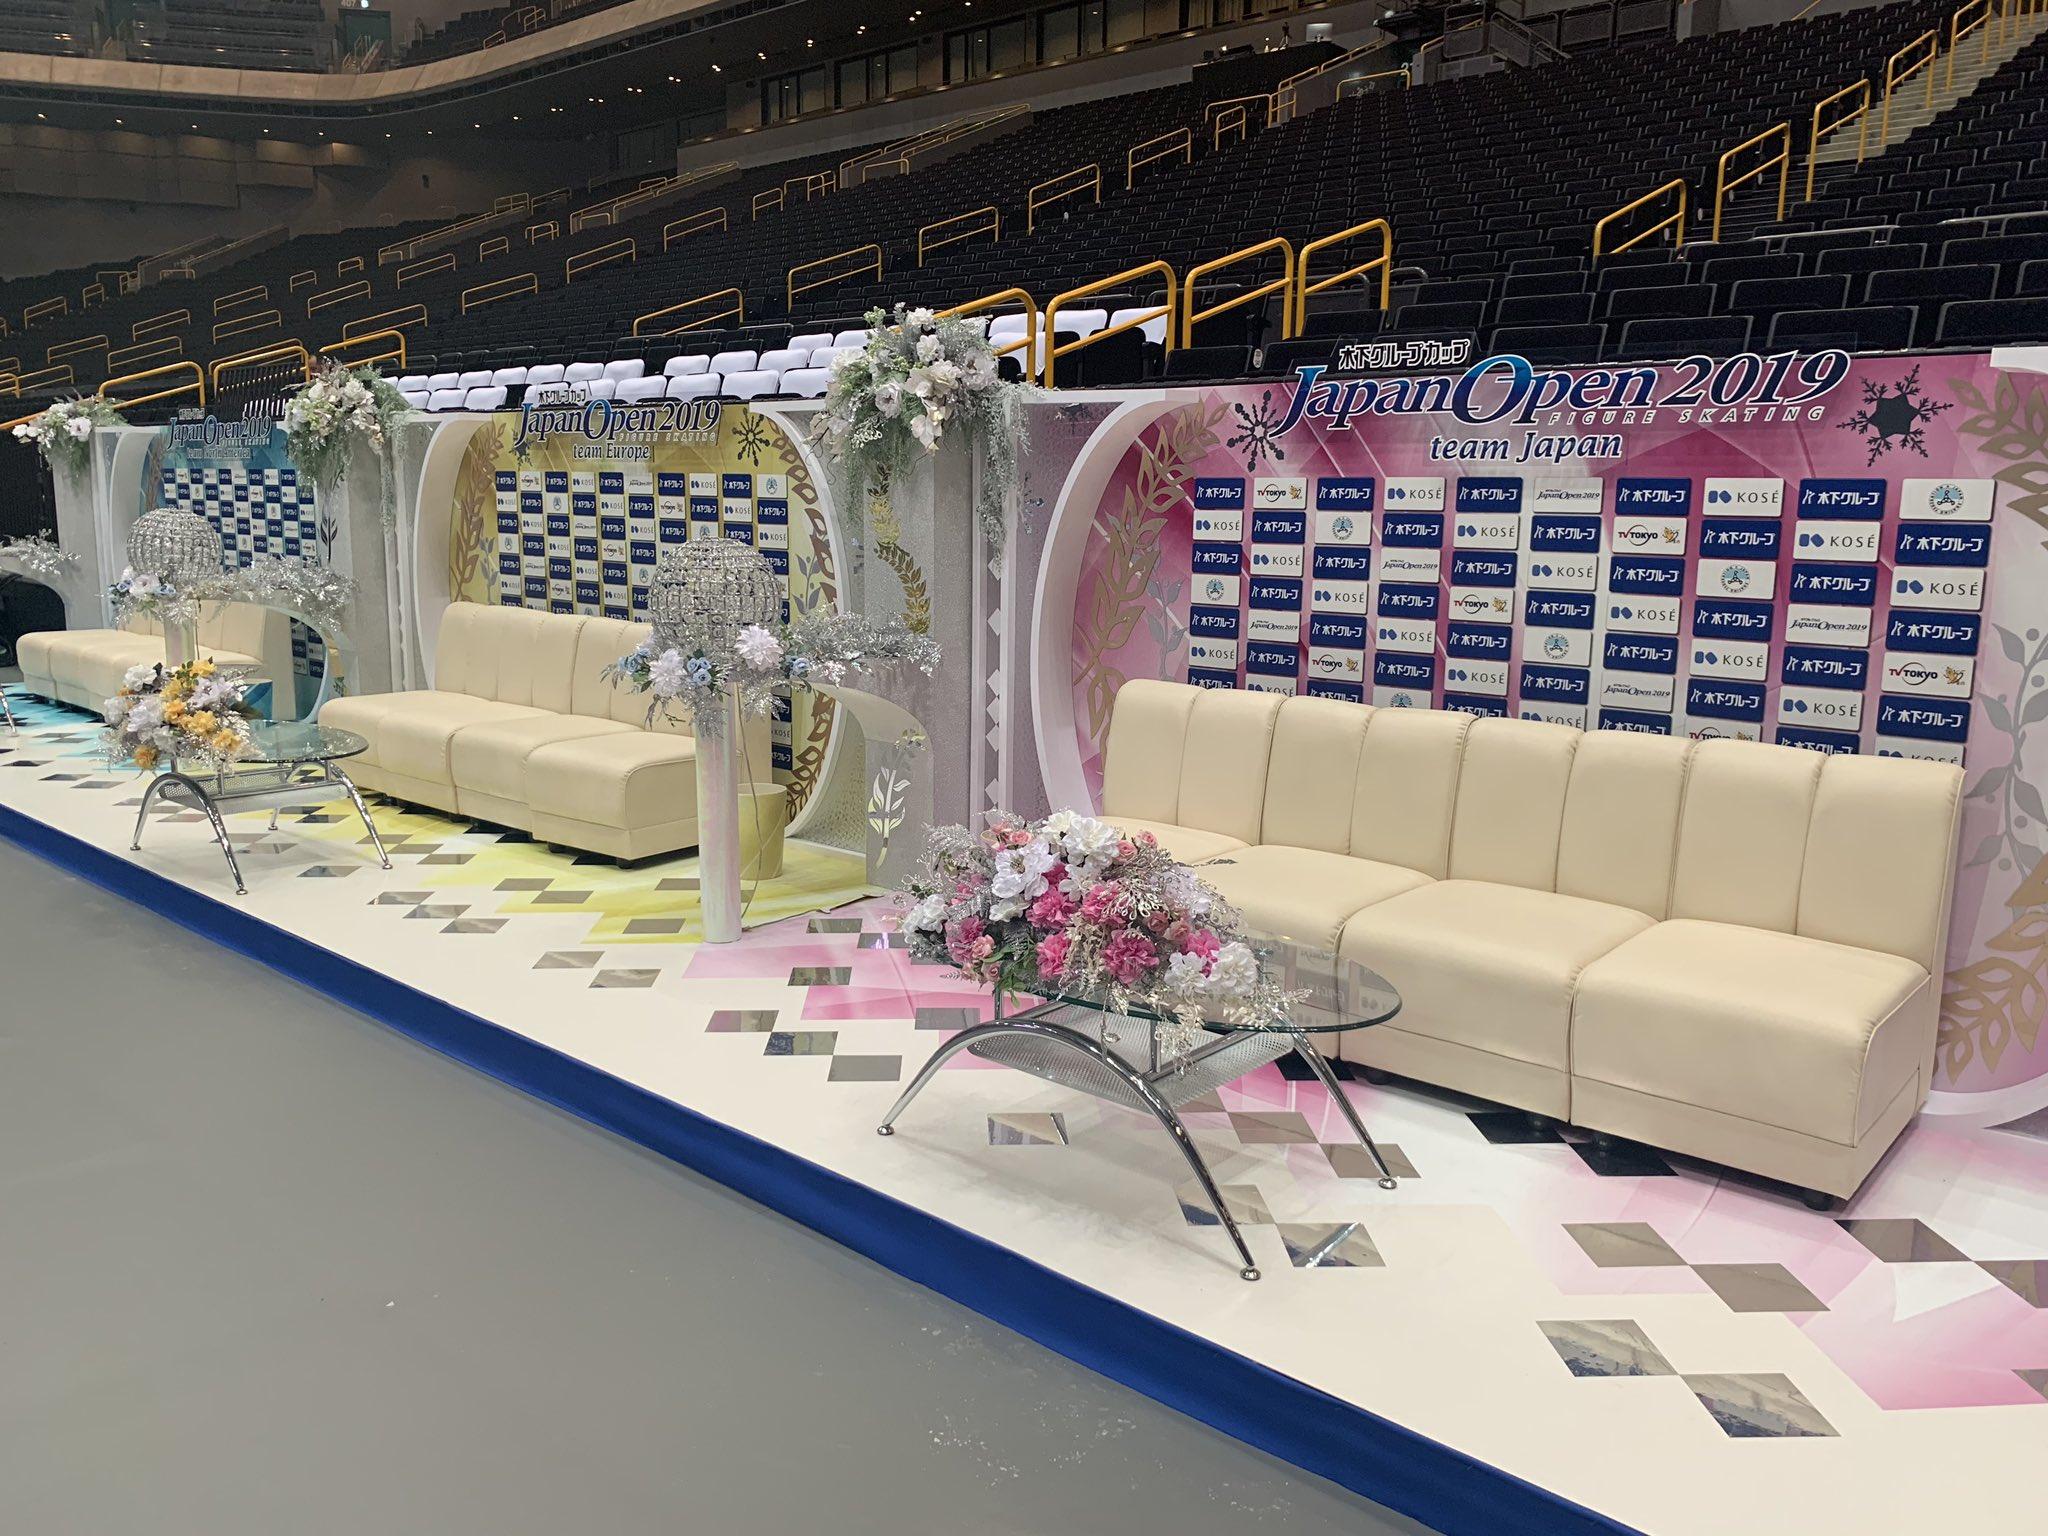 Japan Open 2019 | 5 октября 2019 | Saitama Super Arena - Страница 2 EGATcptU0AAwjSA?format=jpg&name=4096x4096